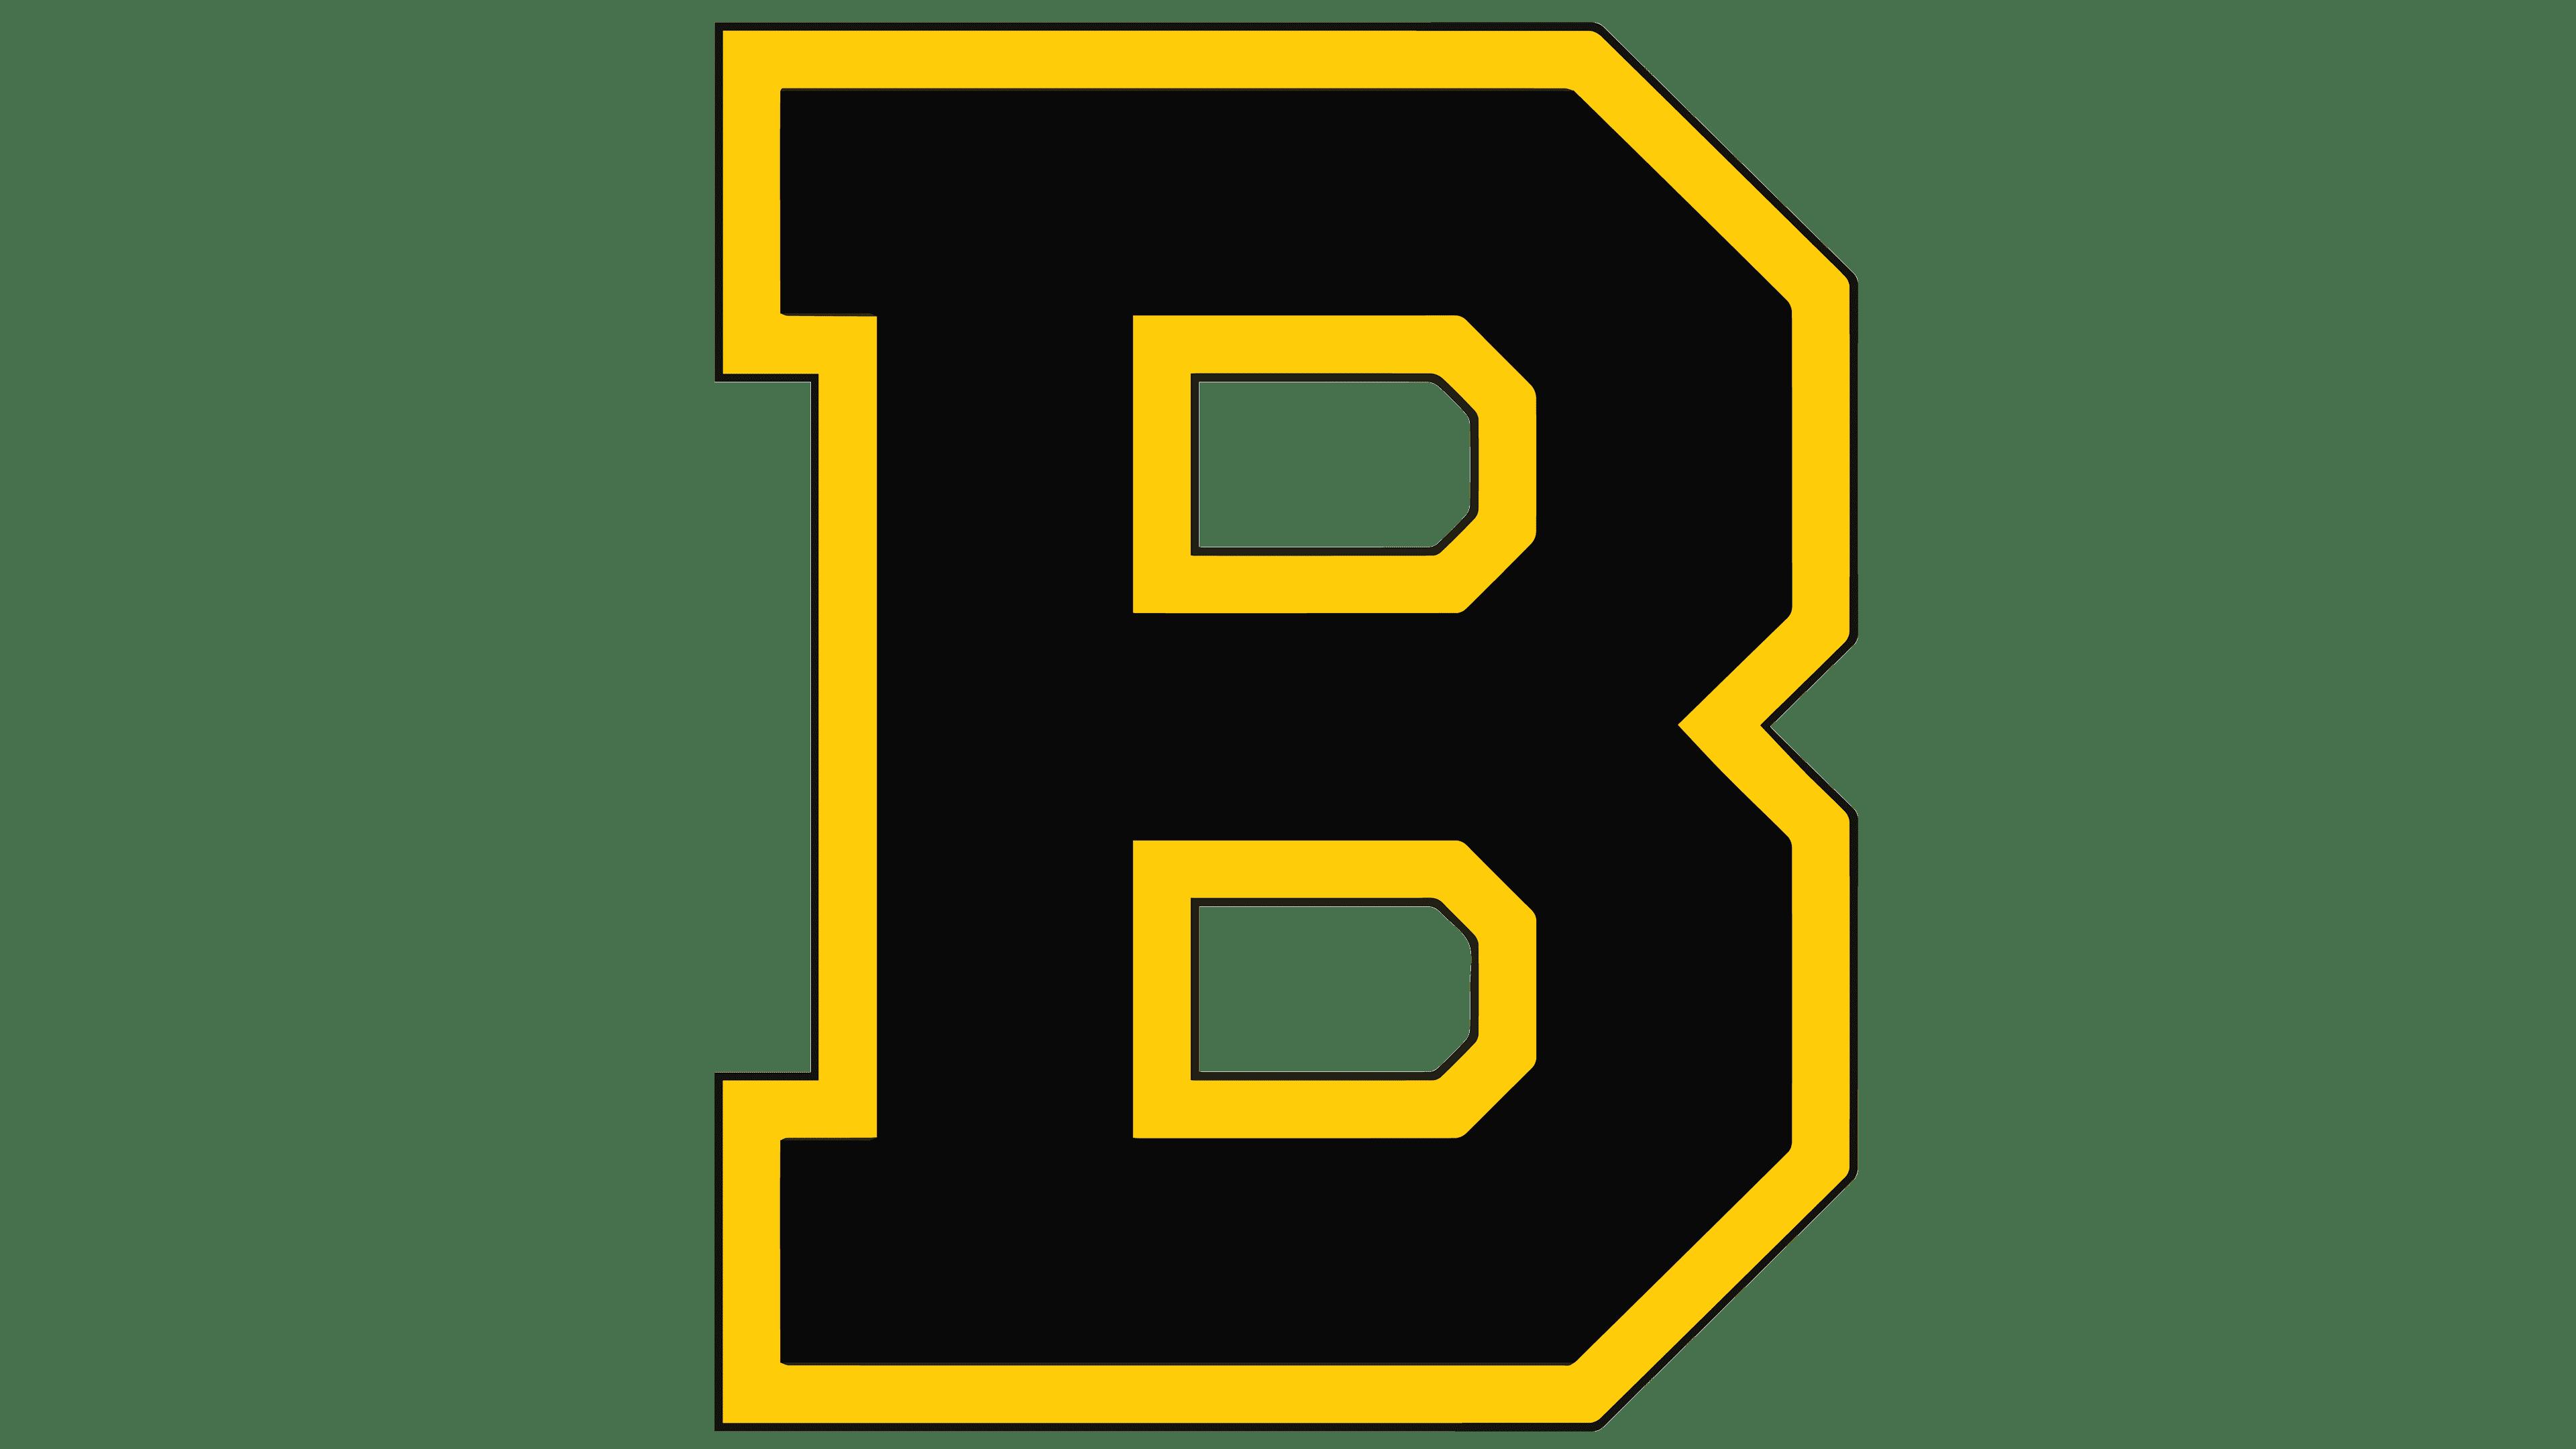 Boston Bruins image